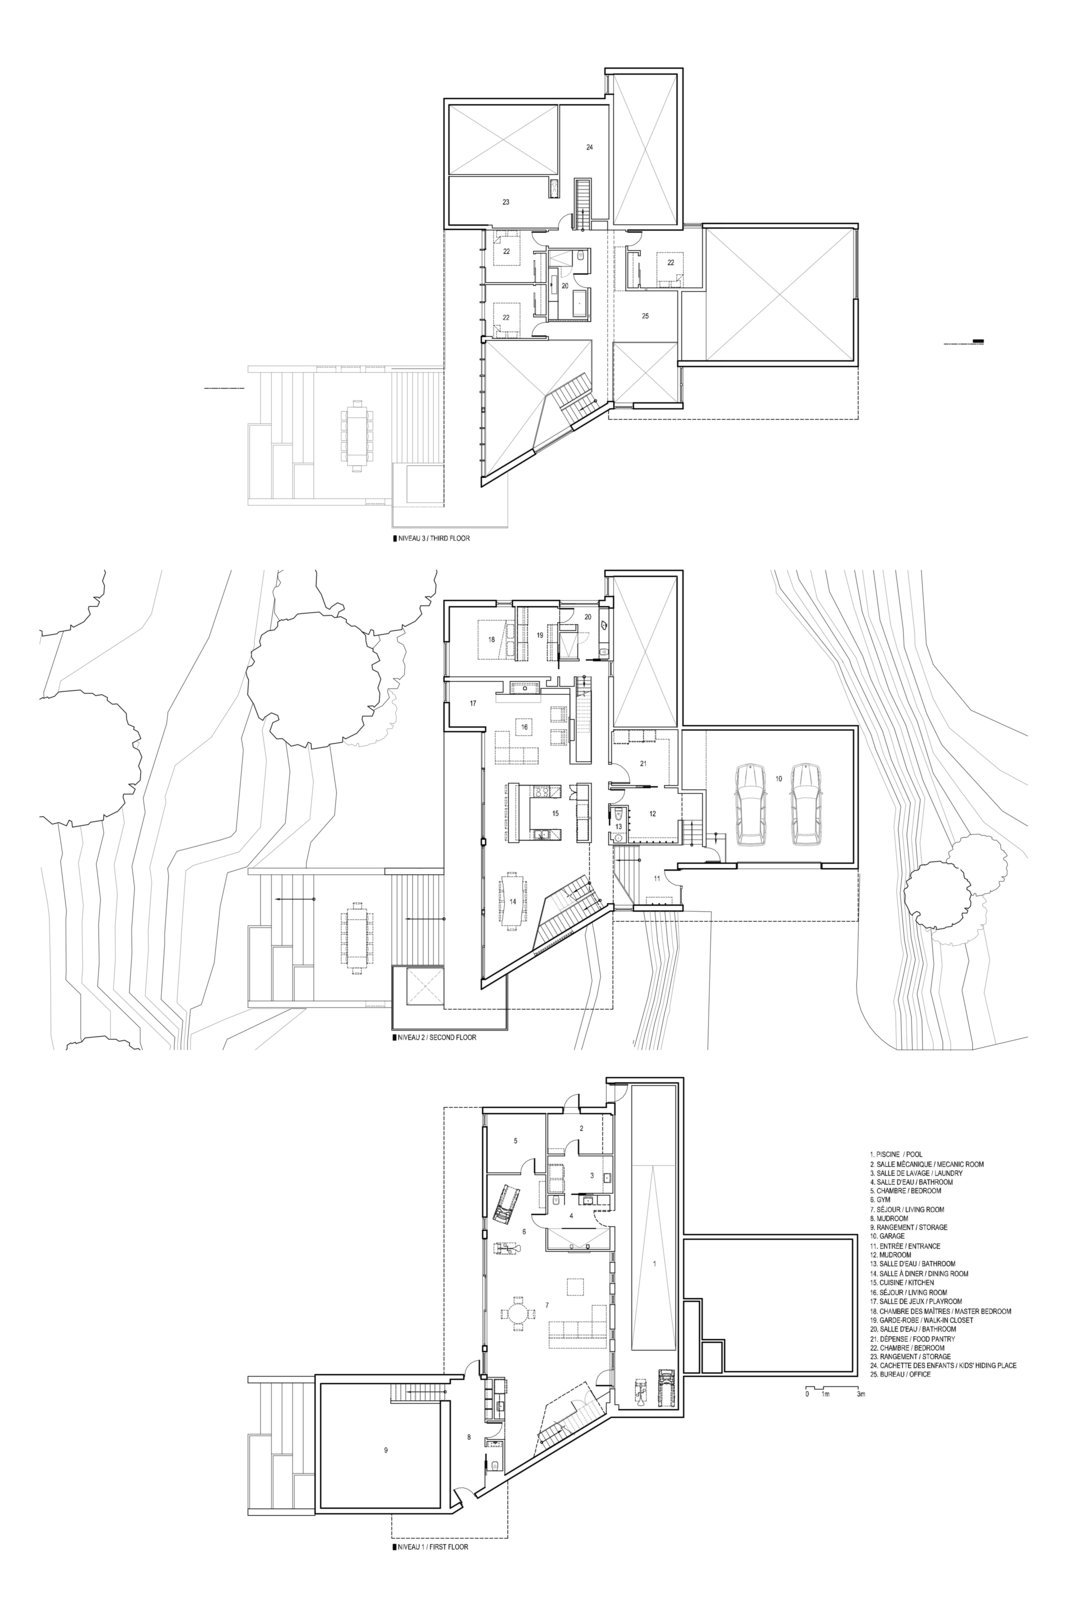 Floor plan drawing of Résidence L'Accostée